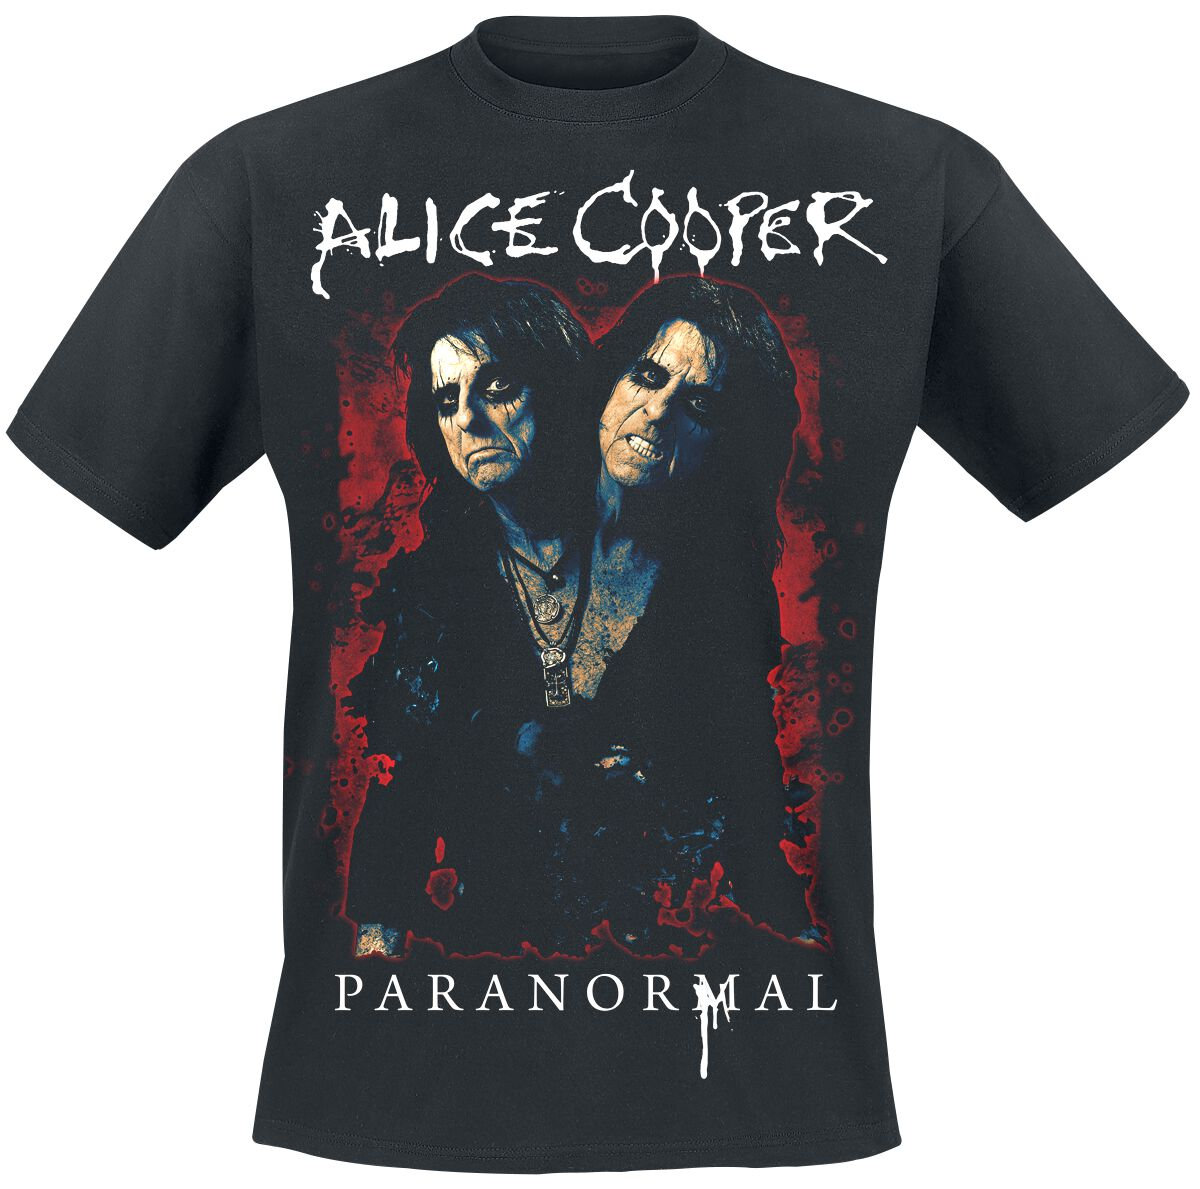 Zespoły - Koszulki - T-Shirt Alice Cooper Paranormal Splatter T-Shirt czarny - 365293